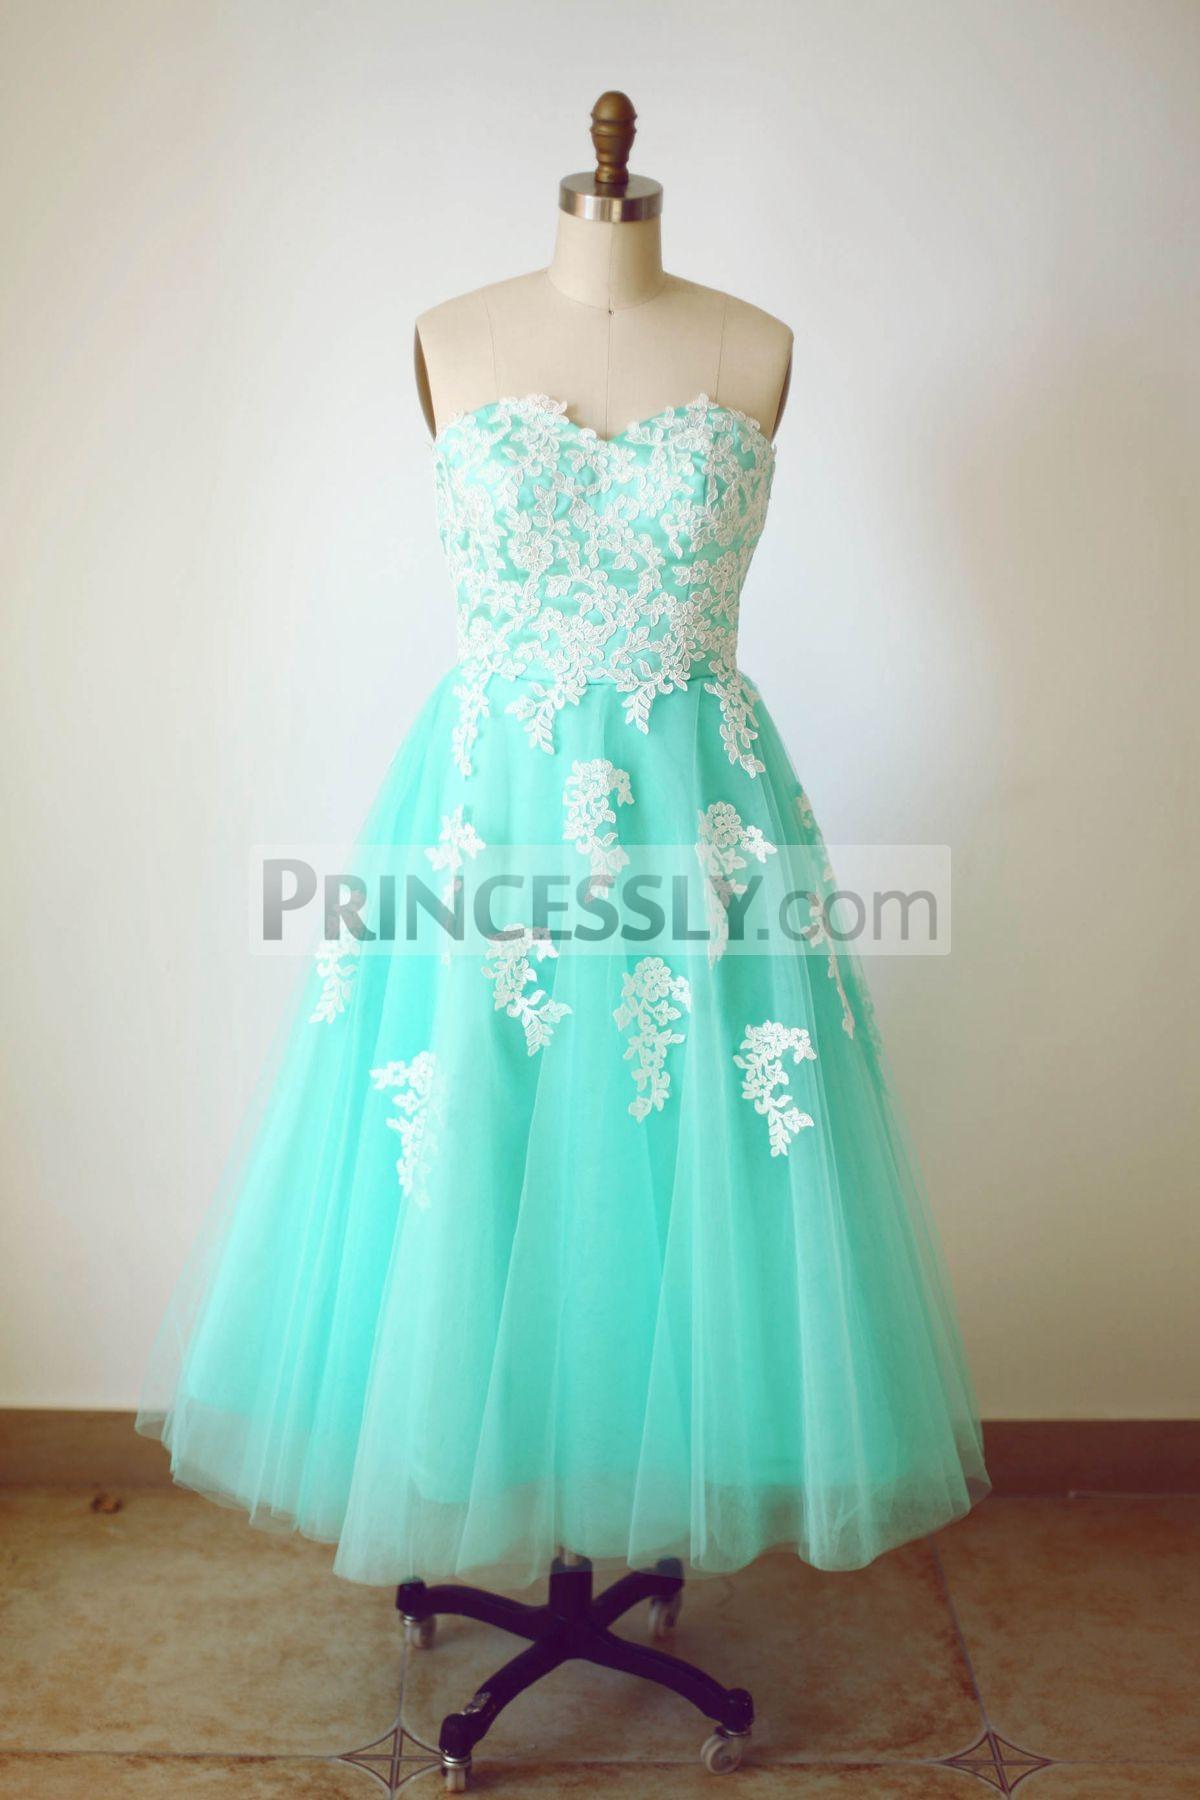 Princessly.com-K1000232-Strapless Sweetheart Mint Blue Tulle Lace Tea Length Short Wedding Dress-31